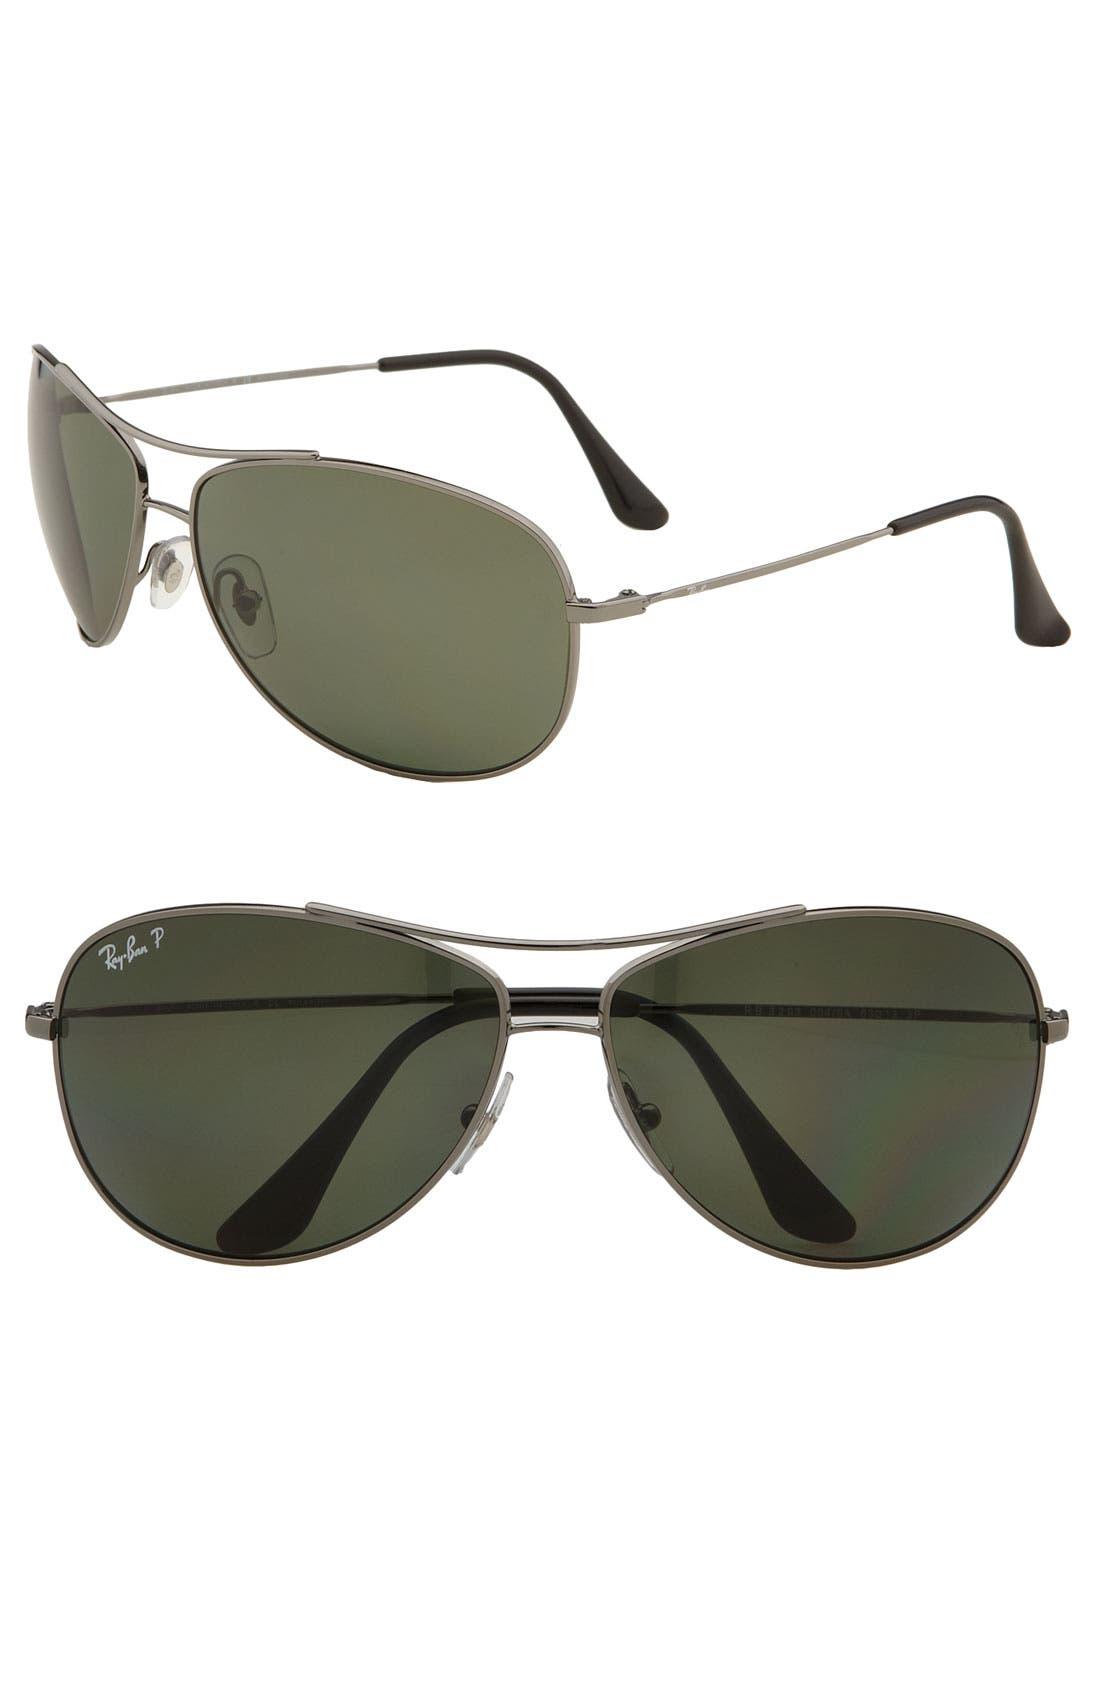 Alternate Image 1 Selected - Ray-Ban 'Bubble Wrap Aviator' Polarized 63mm Sunglasses